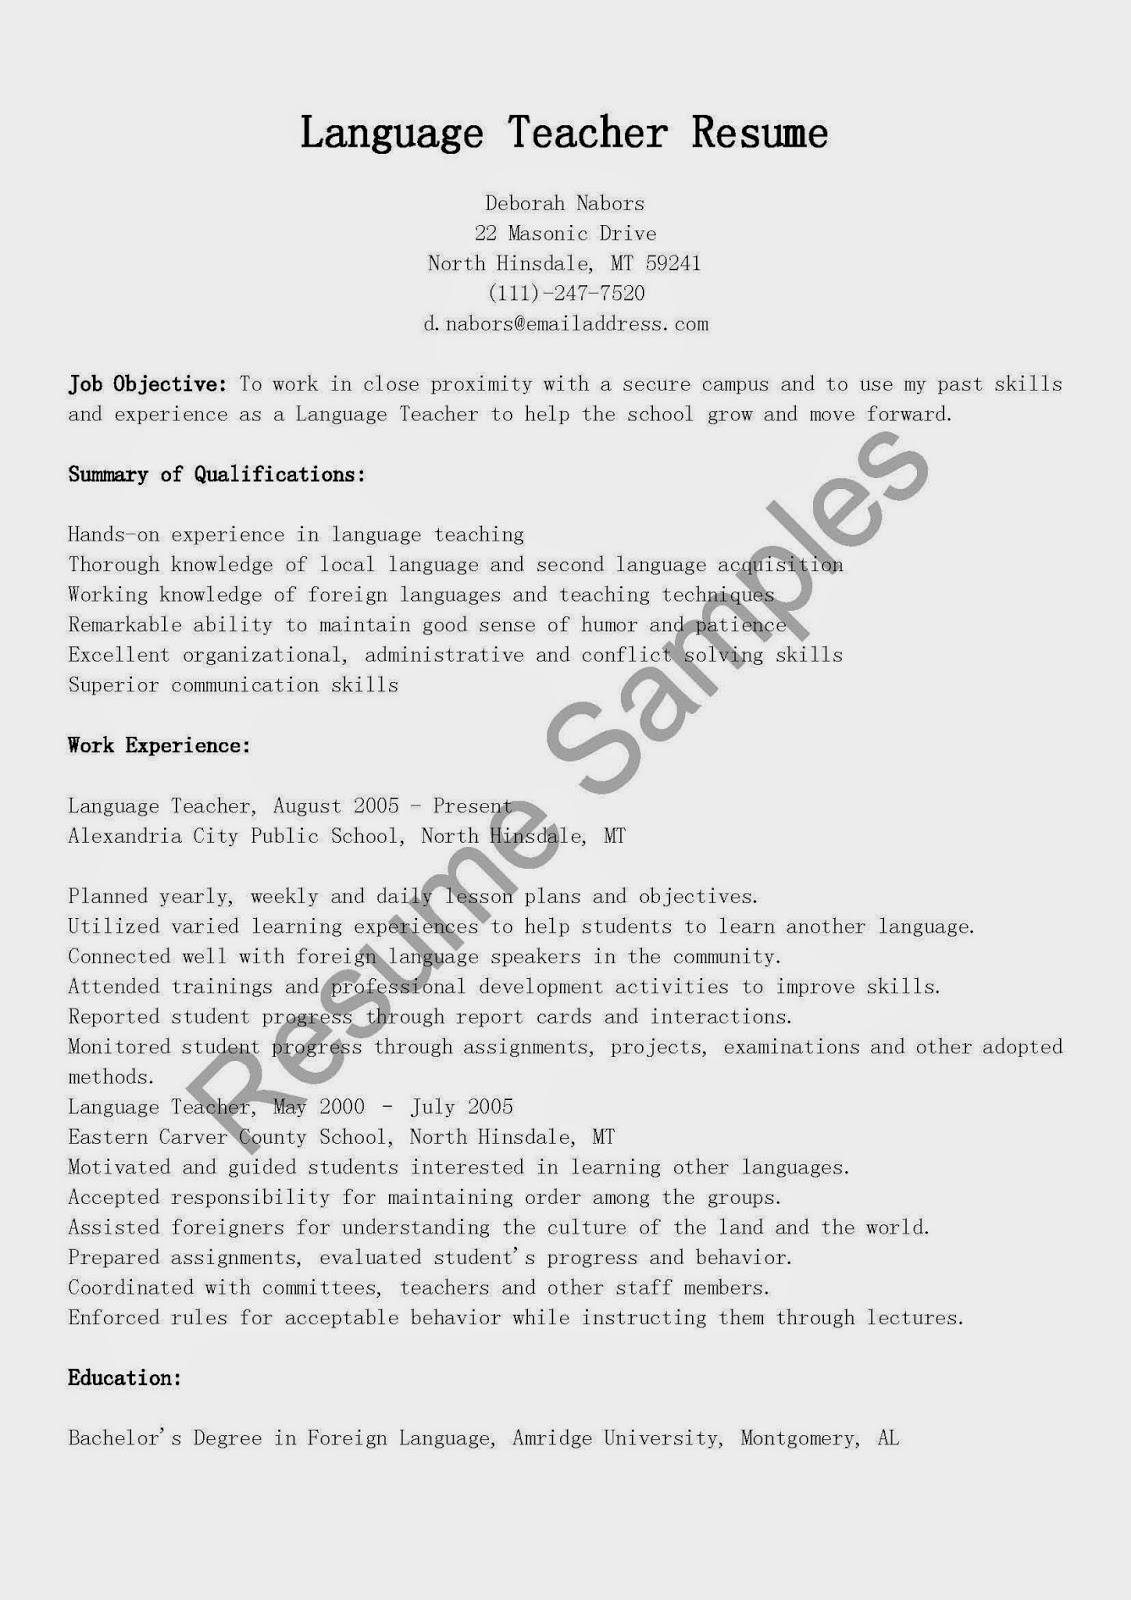 resume samples  language teacher resume sample